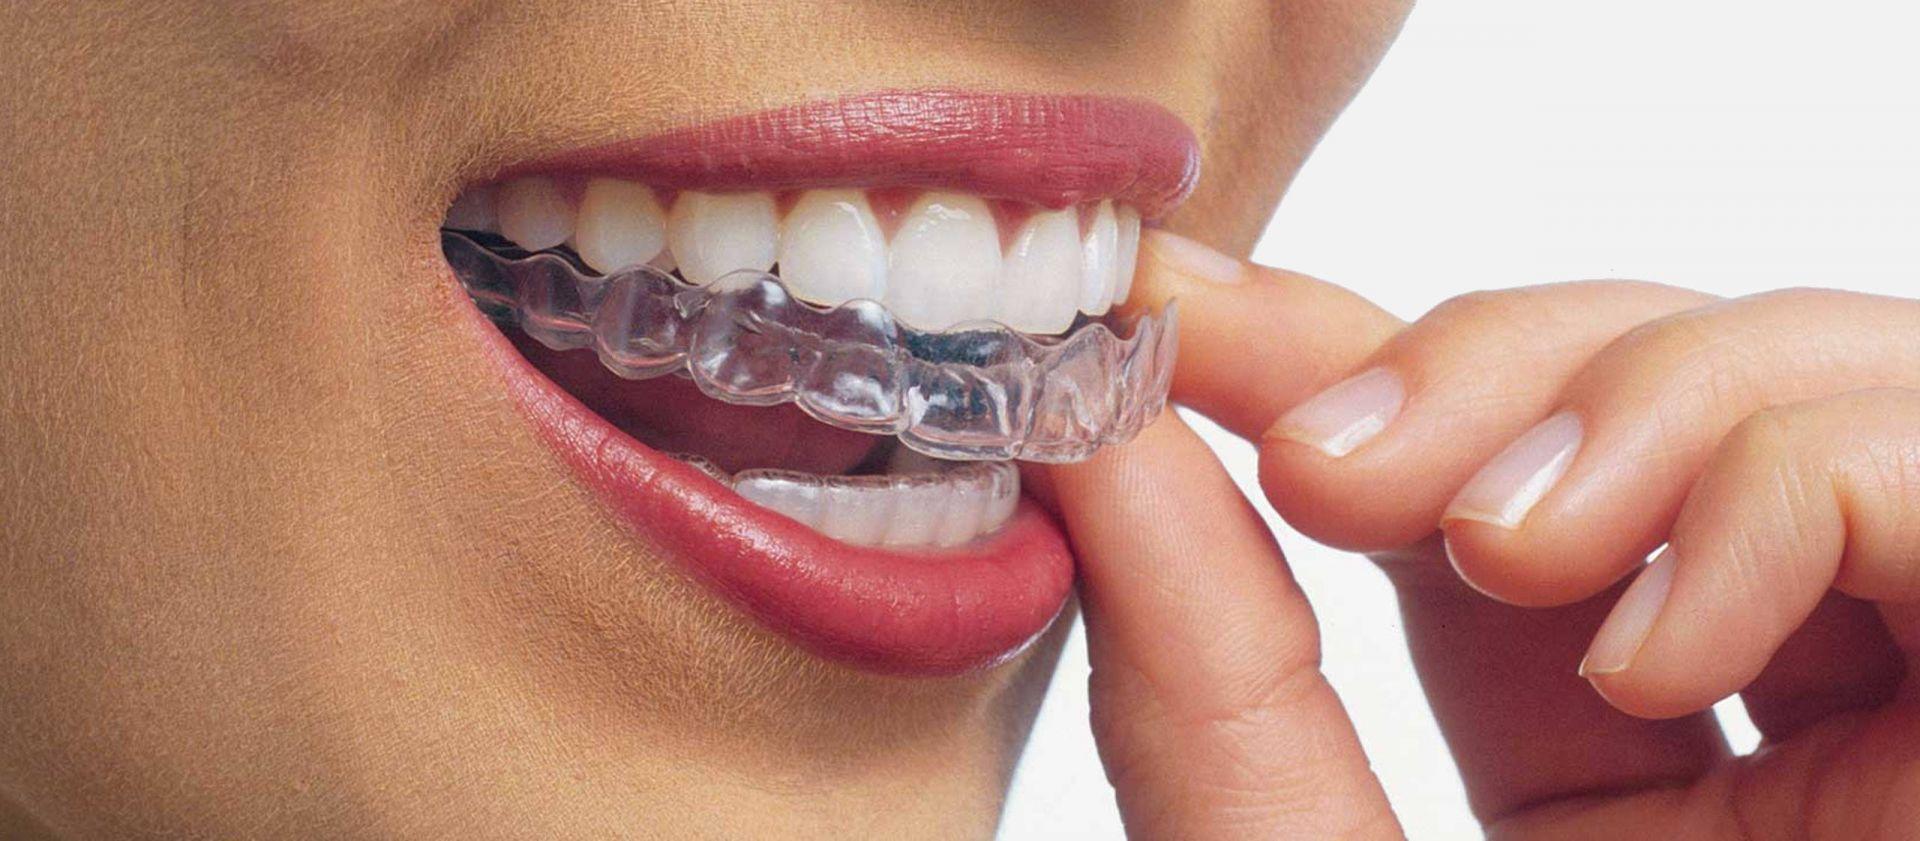 Clinica dentale